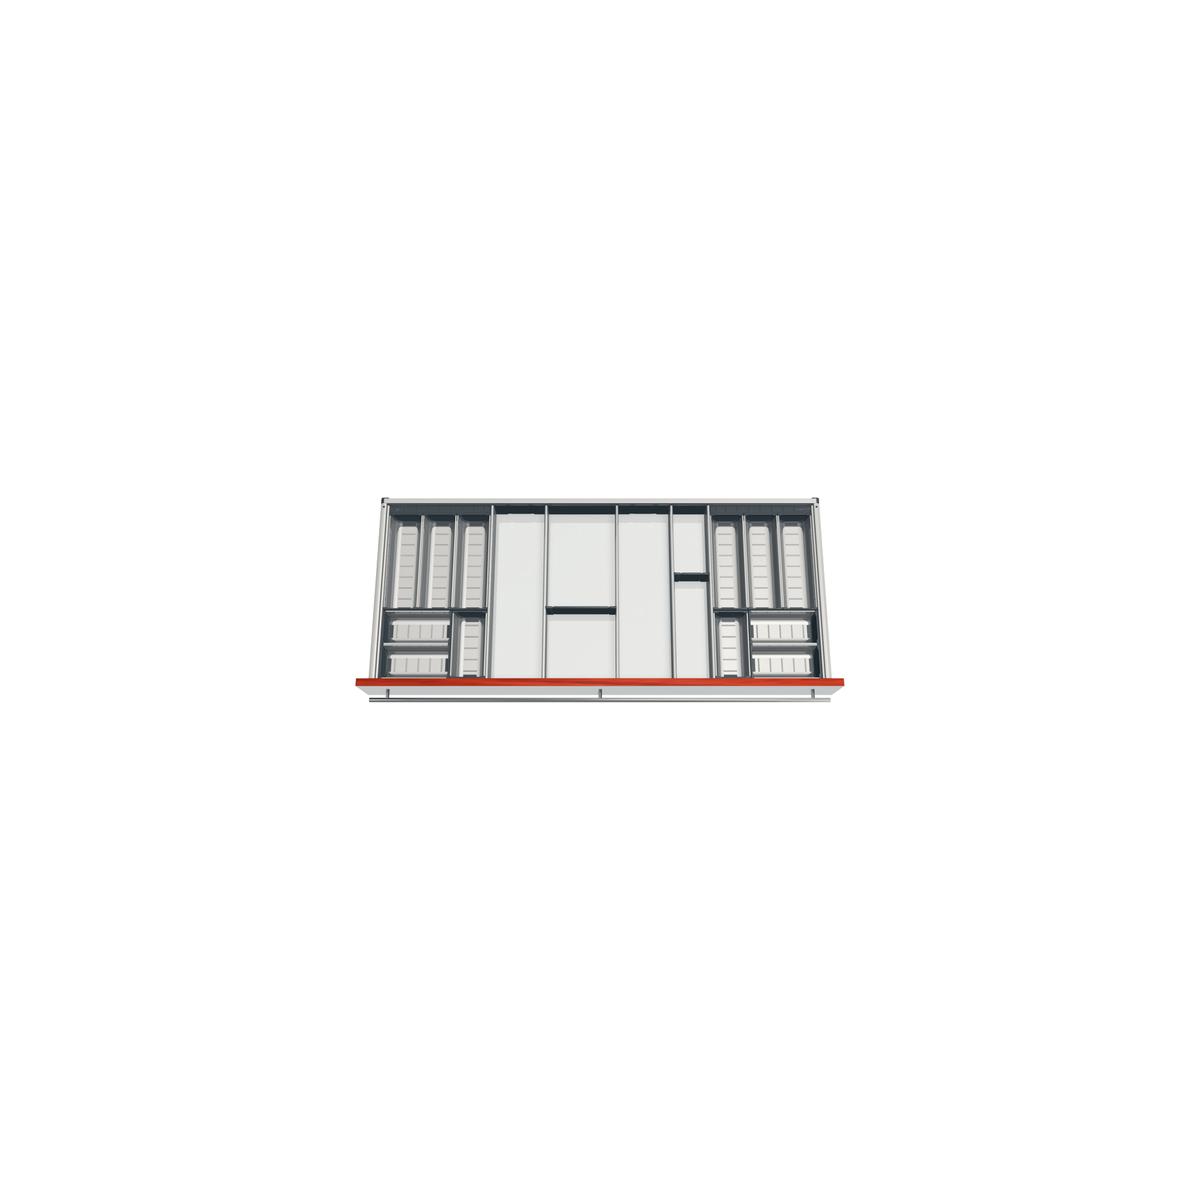 Casier range-couverts 1200mm